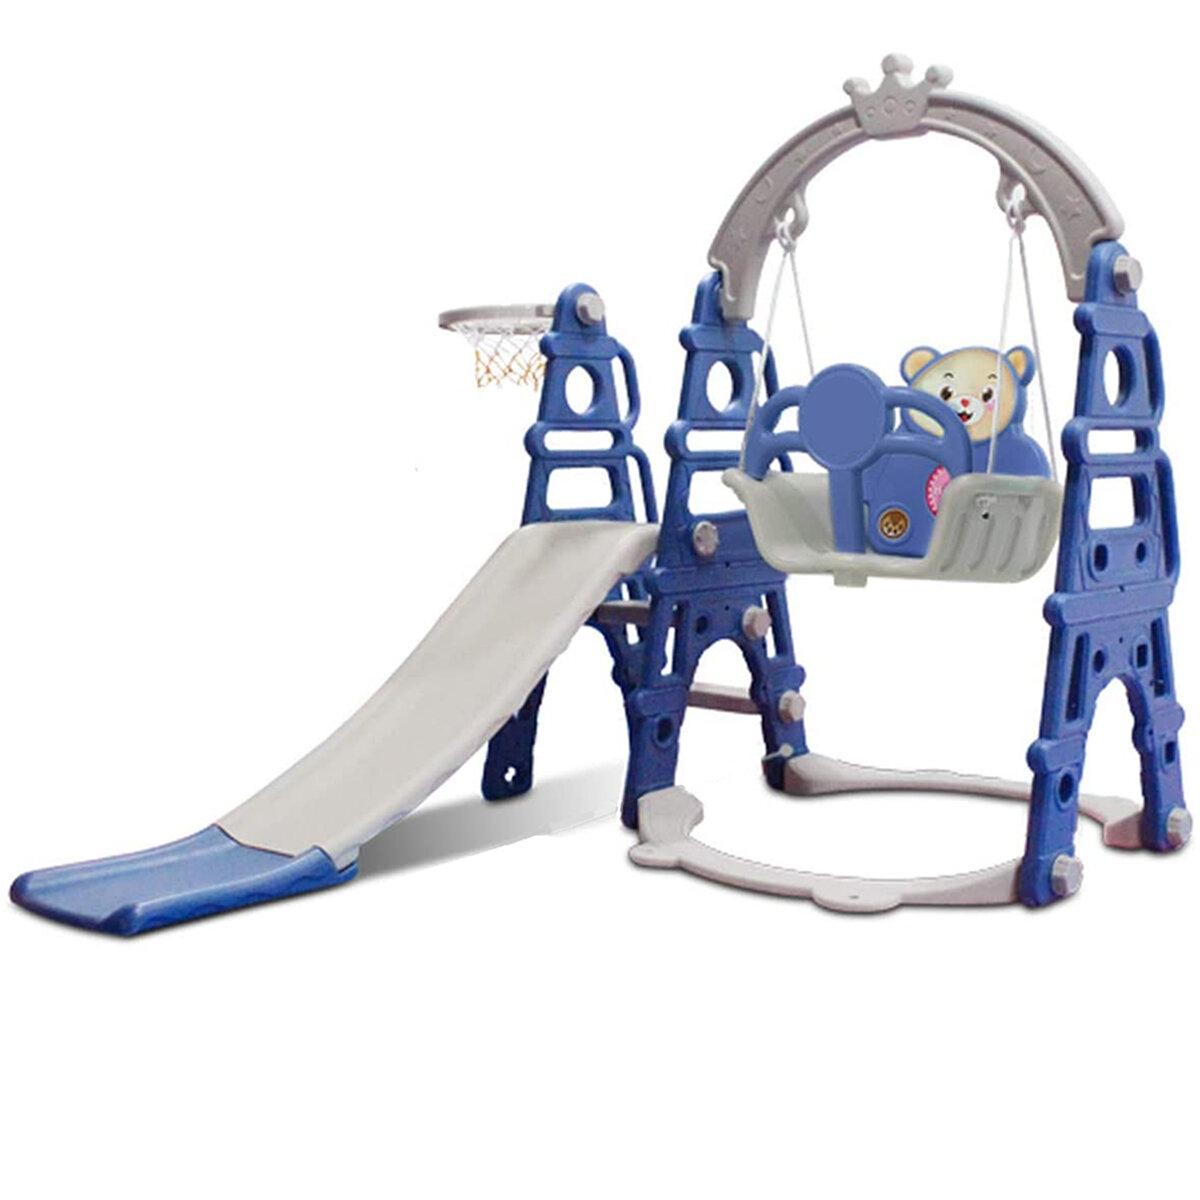 Kingso 2020 New Toddler Plastic Climber Wayfair